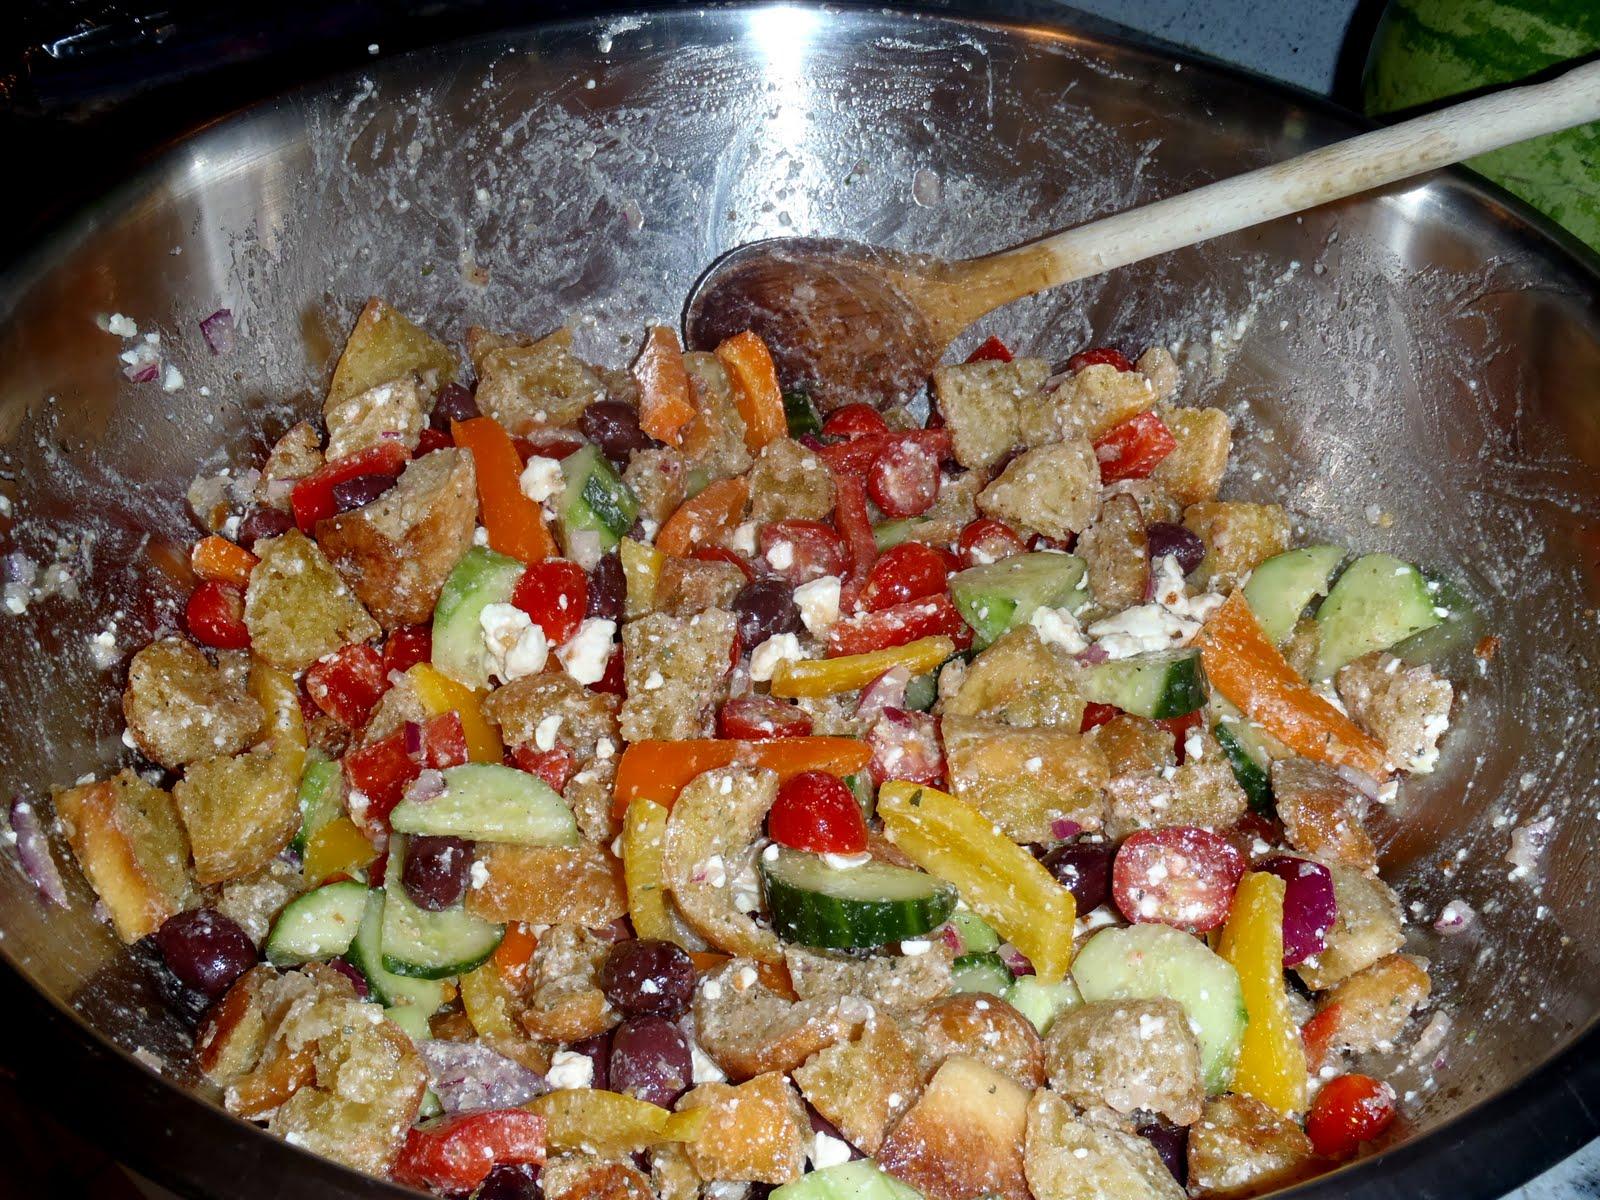 The Garlic Goddess Greek Panzanella Salad